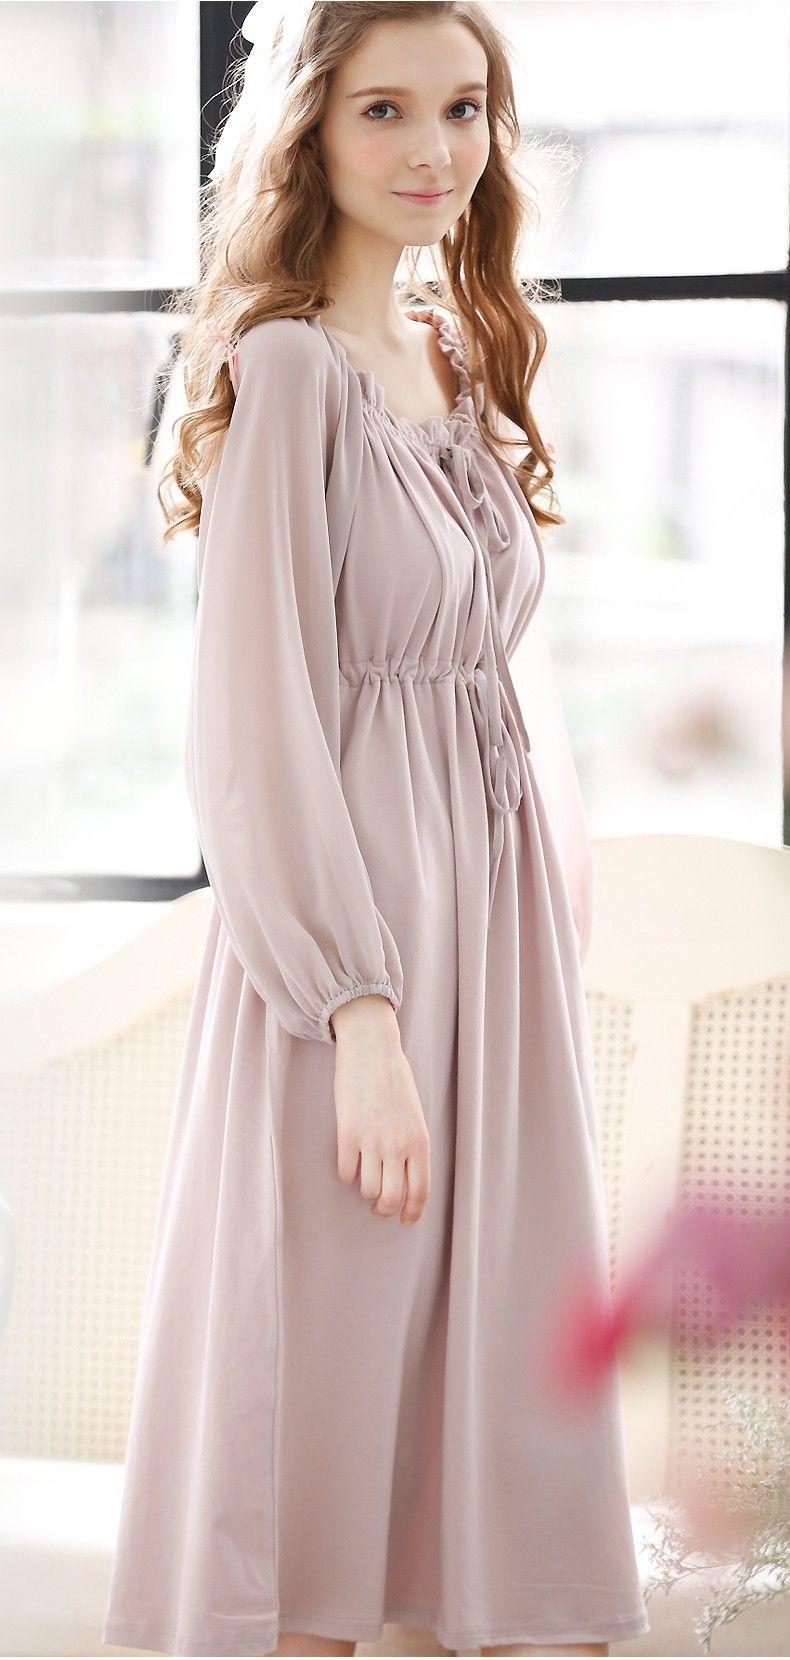 1d9e55106c6c Elegant Light Purple Cotton   Chiffon Puff Sleeve Sleepwear ...